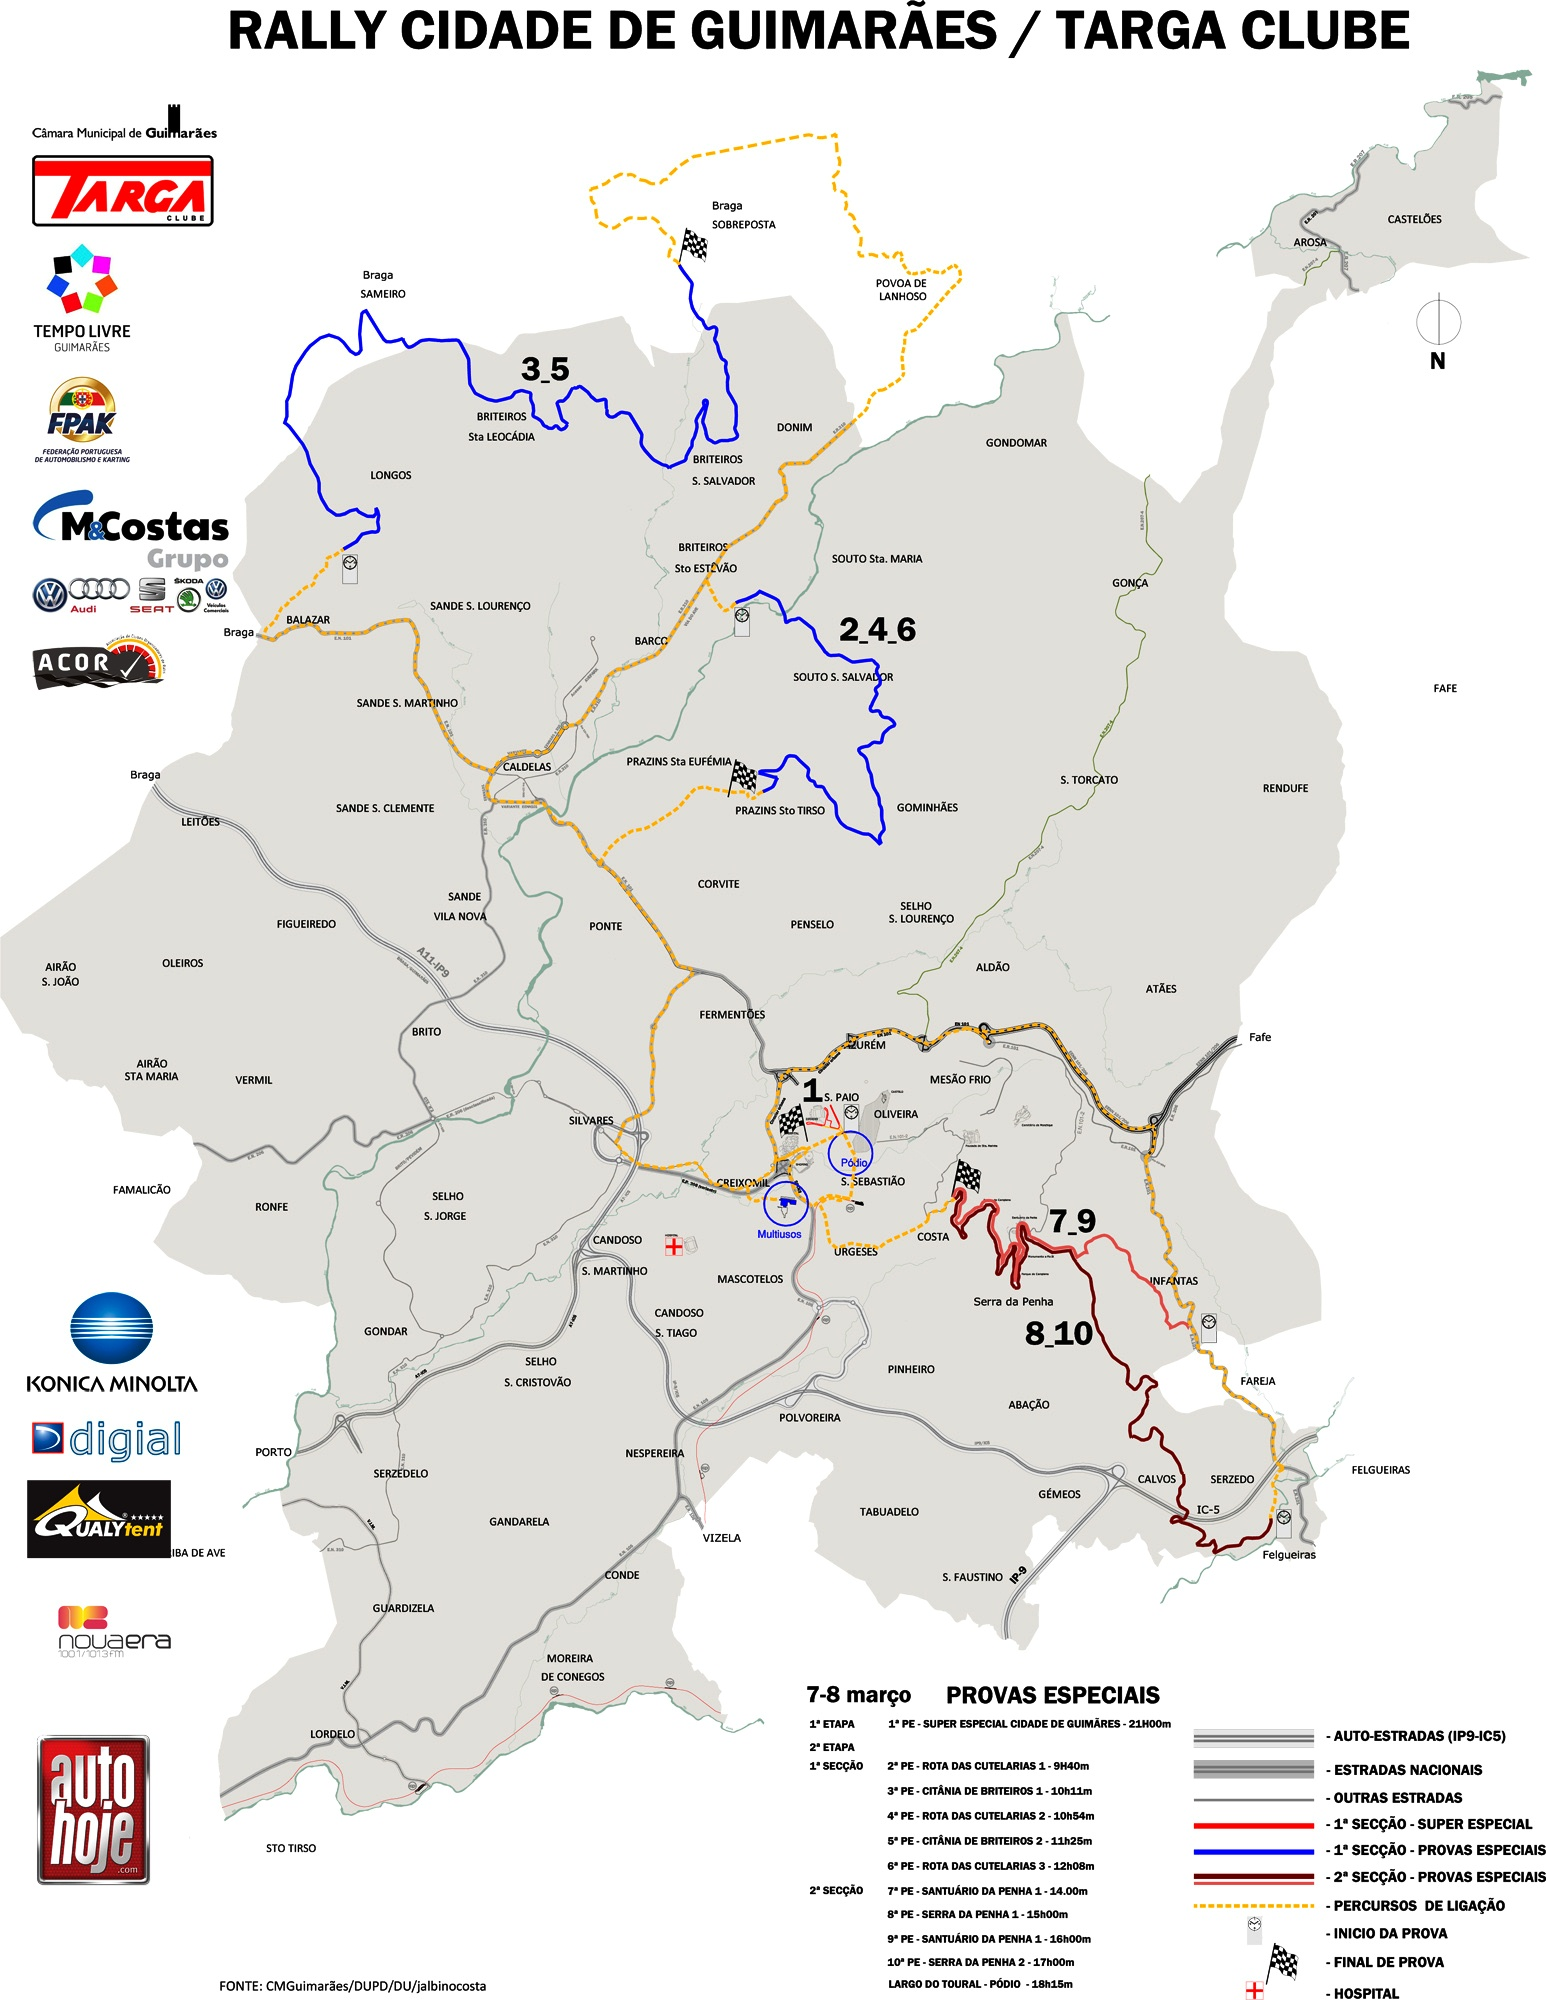 mapa rali portugal Mapa Rali Cidade de Guimarães 2014 mapa rali portugal